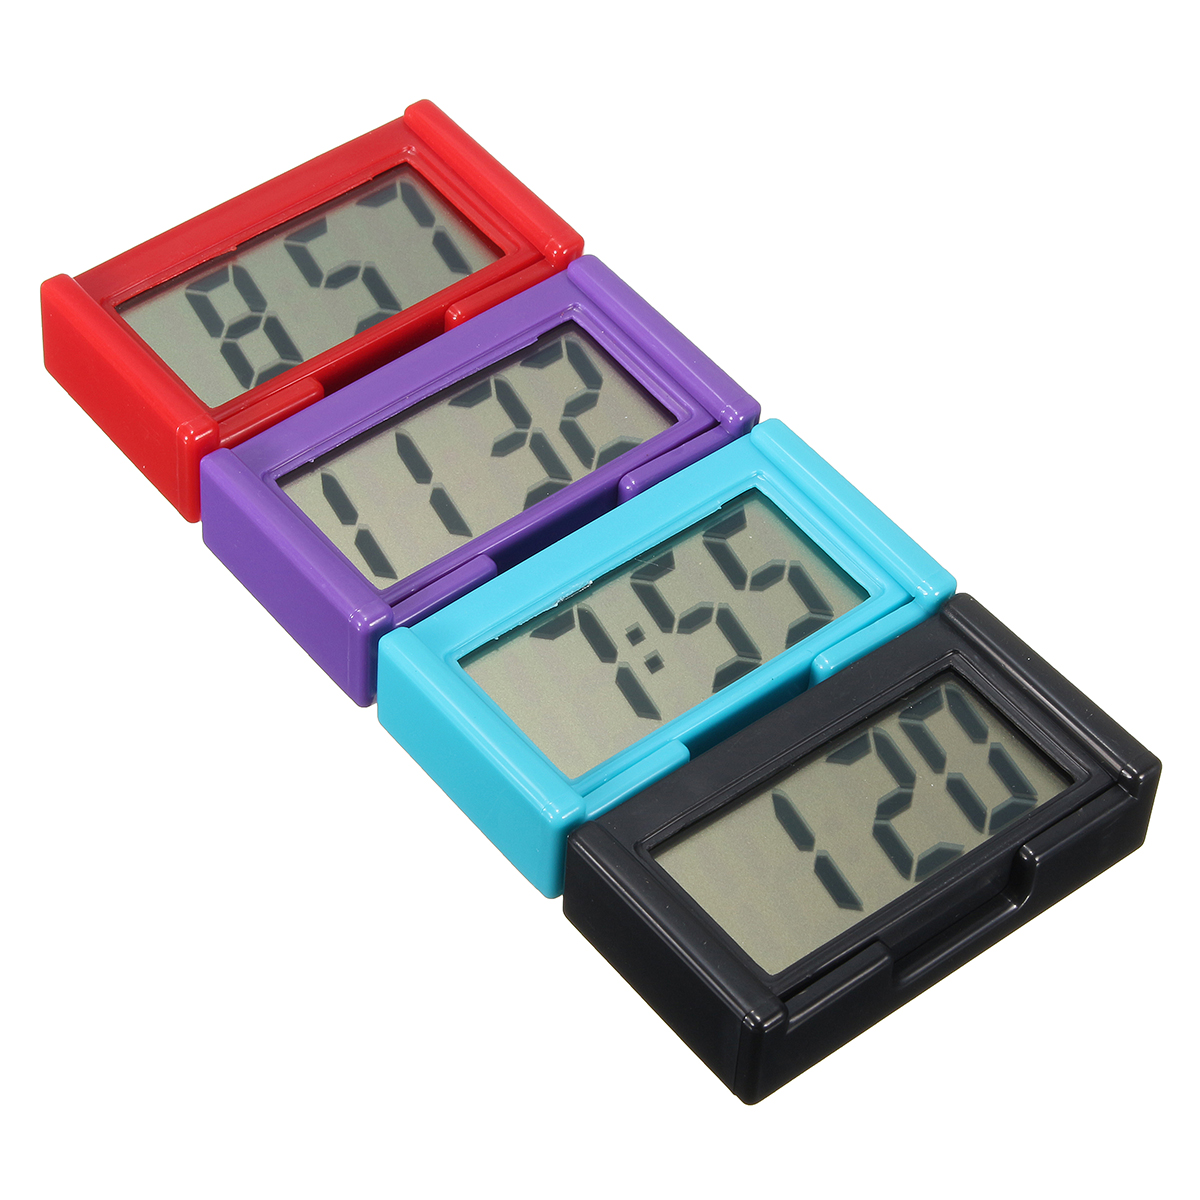 4 Colors Automotive Digital Car LCD Clock Self-Adhesive Stick On Time Portable (Eachine1) Cambridge Цены на товары